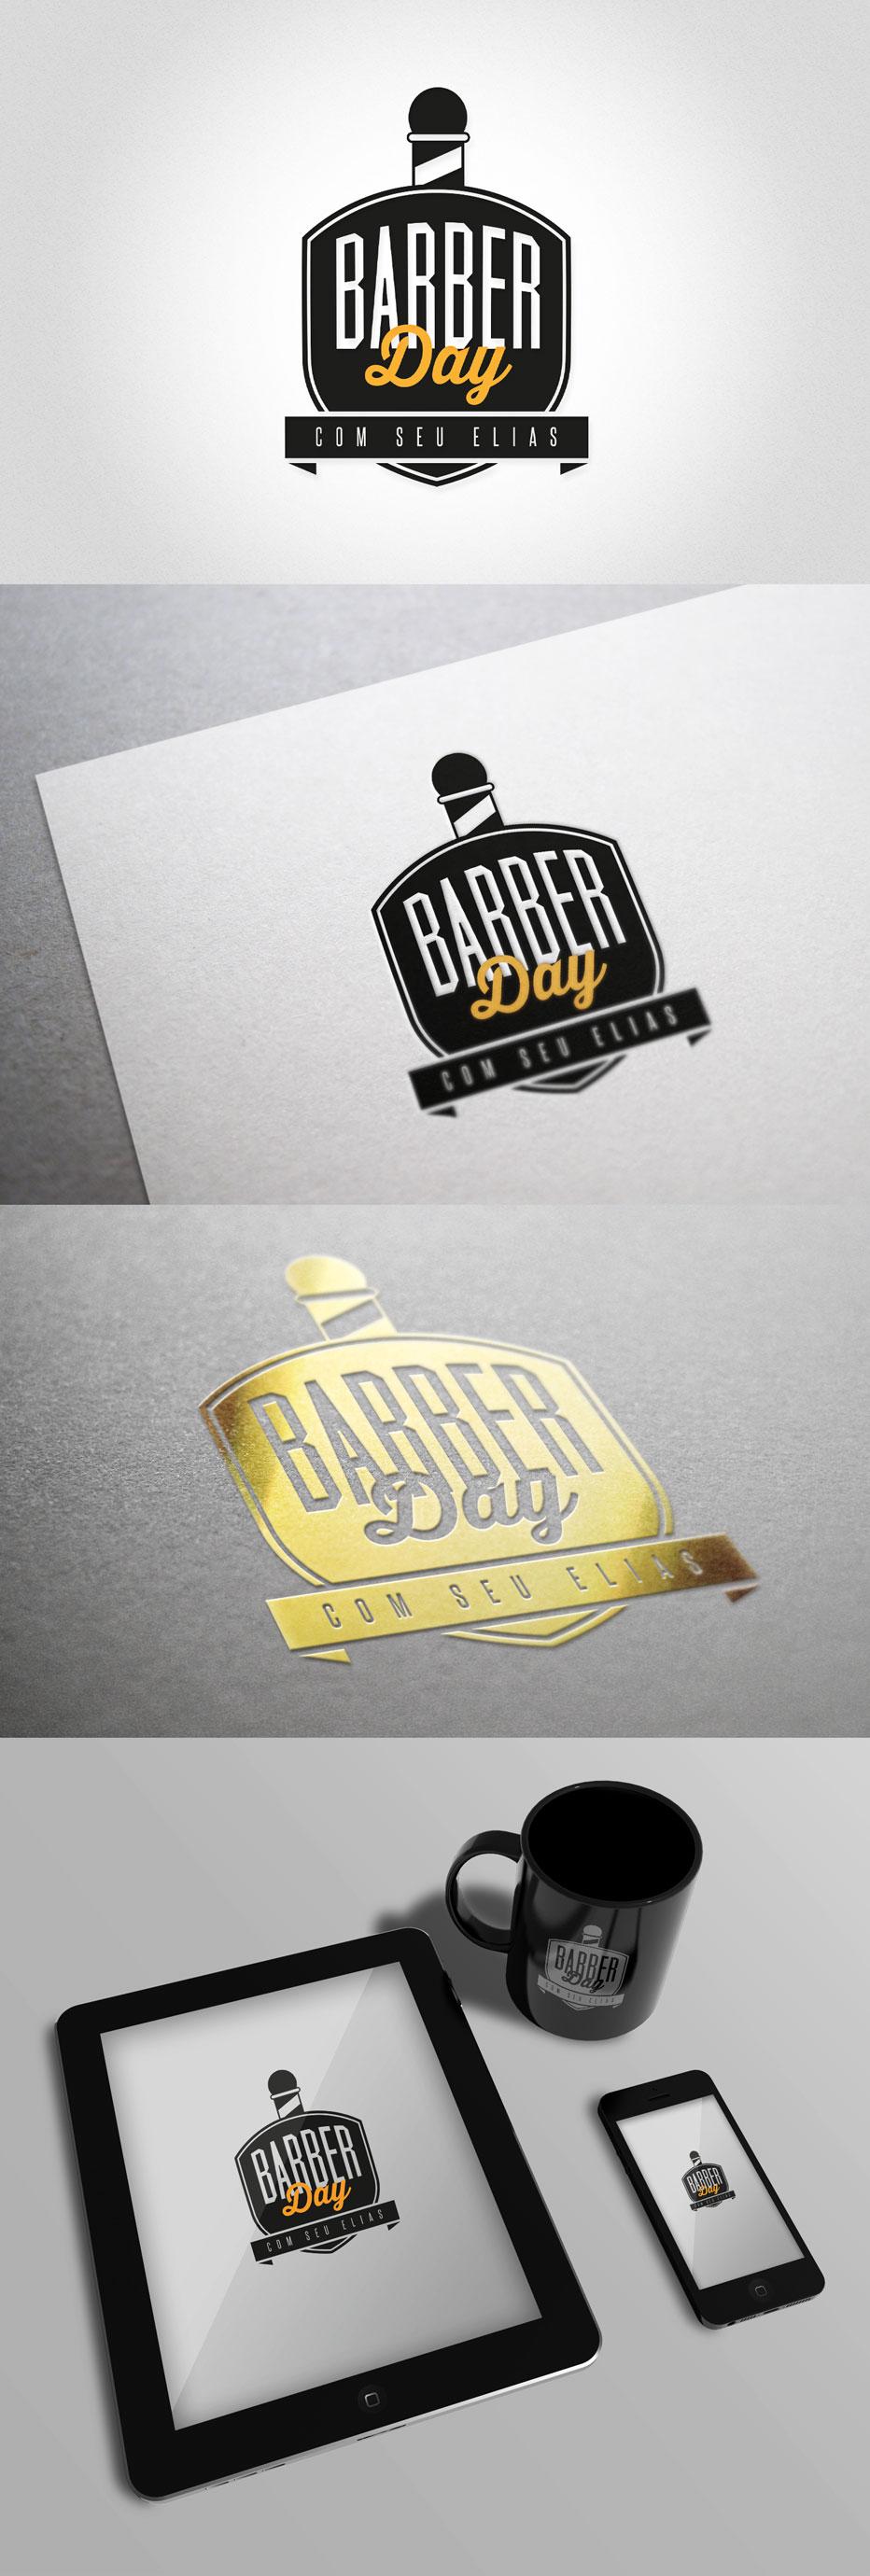 barberday